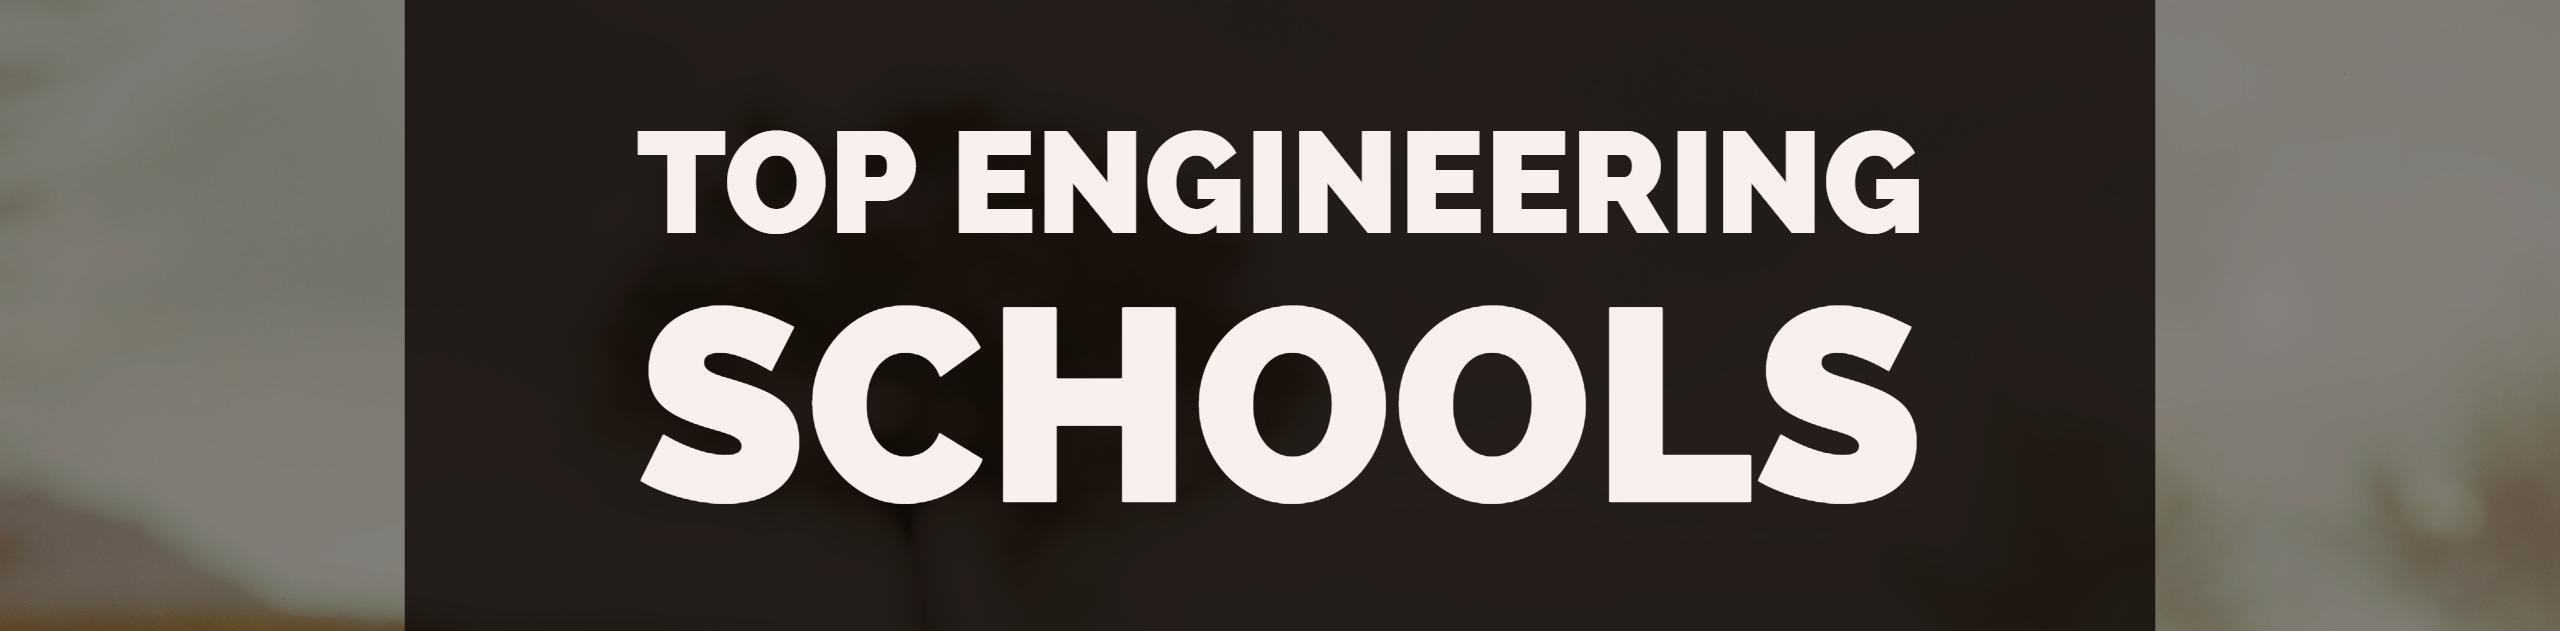 Engineering Schools, Jobs and Resources